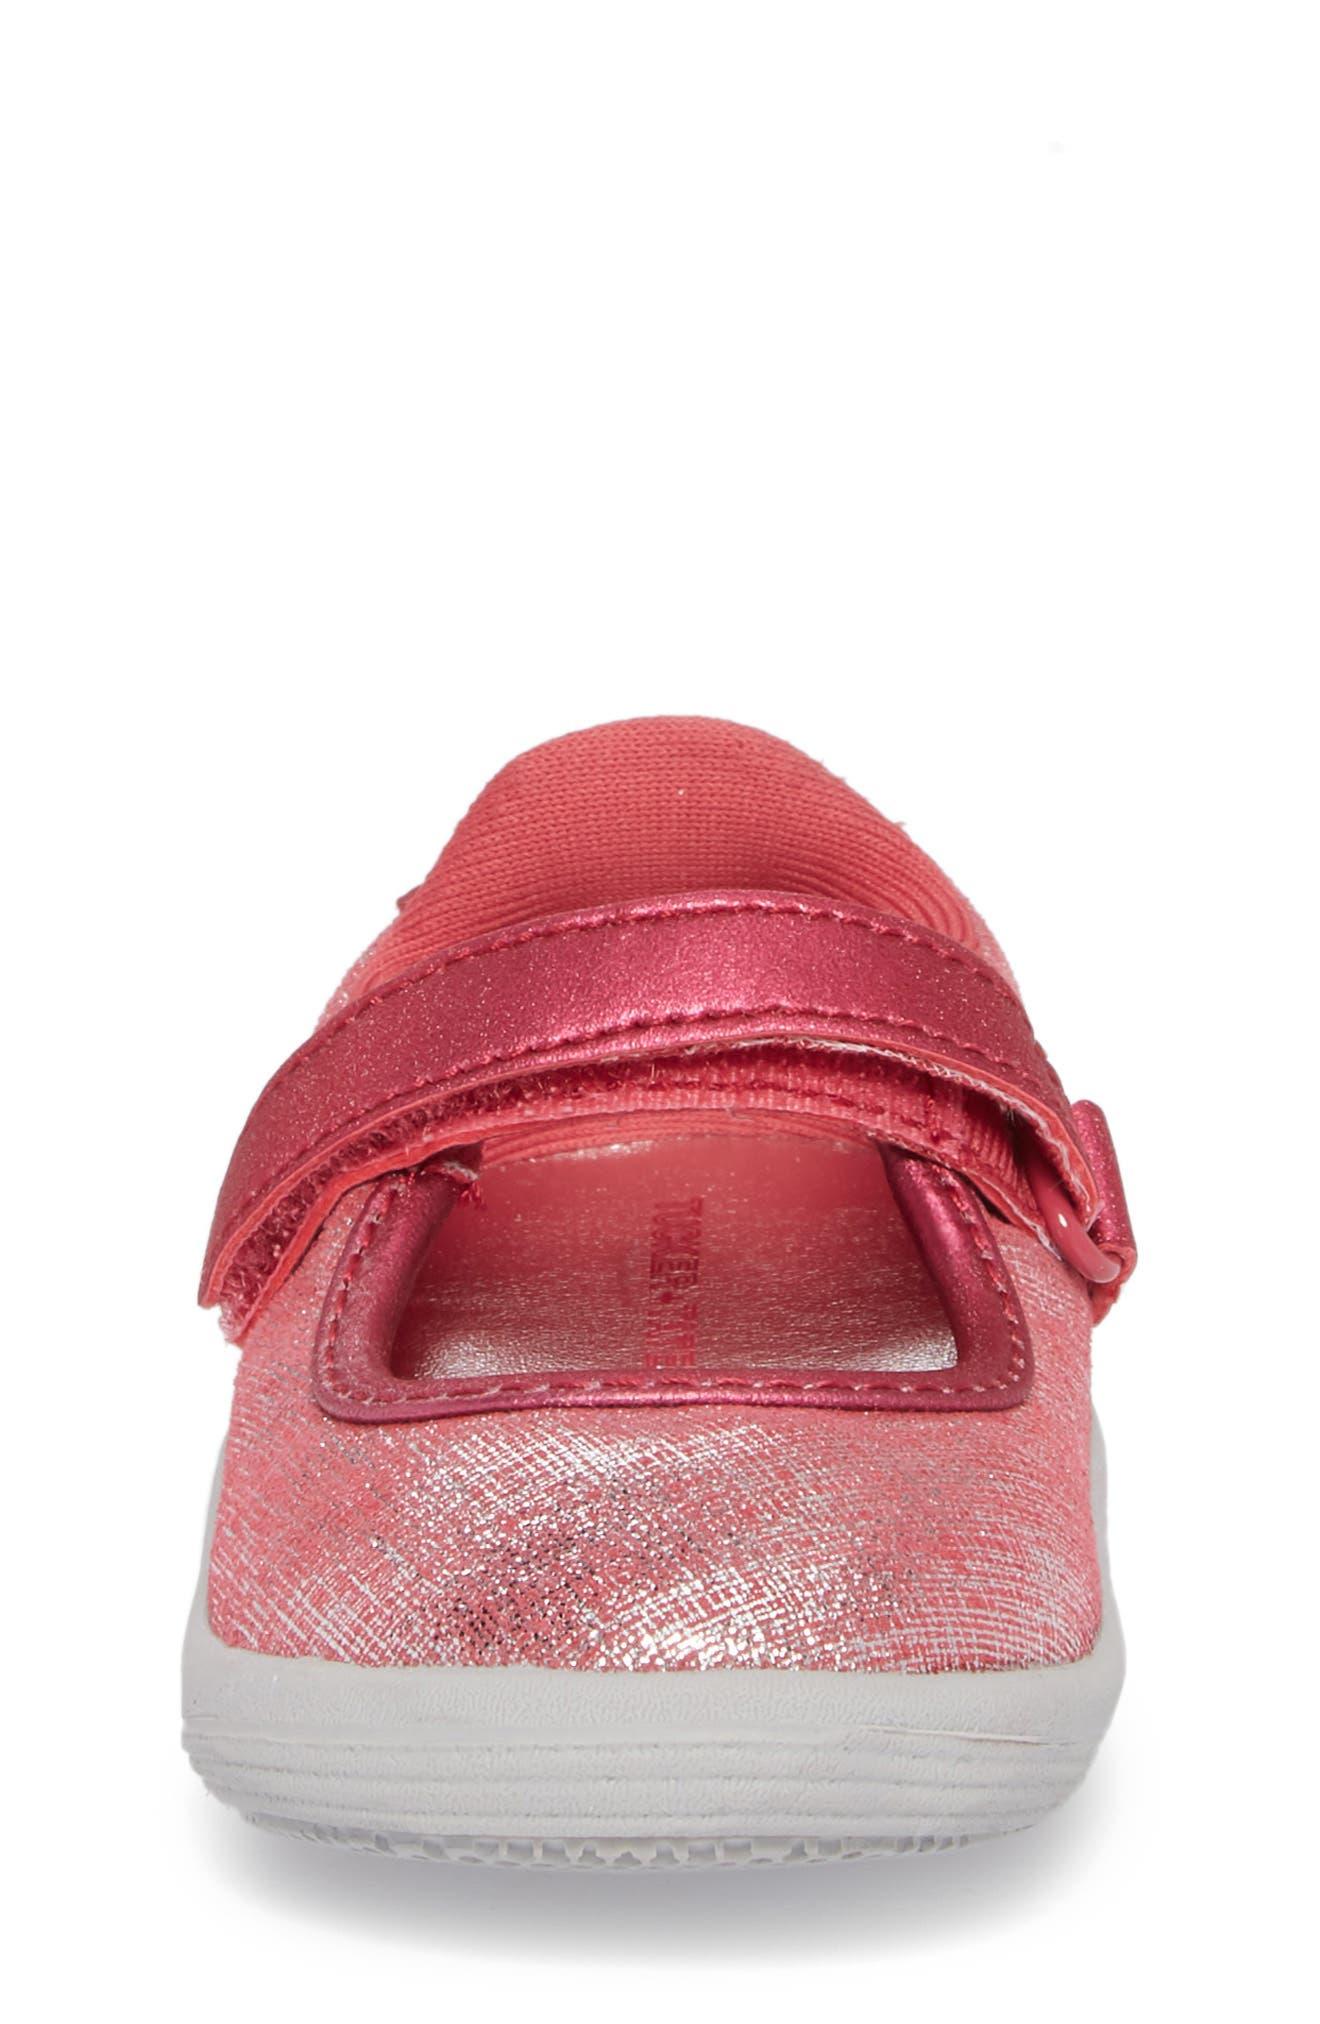 Nora Metallic Mary Jane Sneaker,                             Alternate thumbnail 4, color,                             650